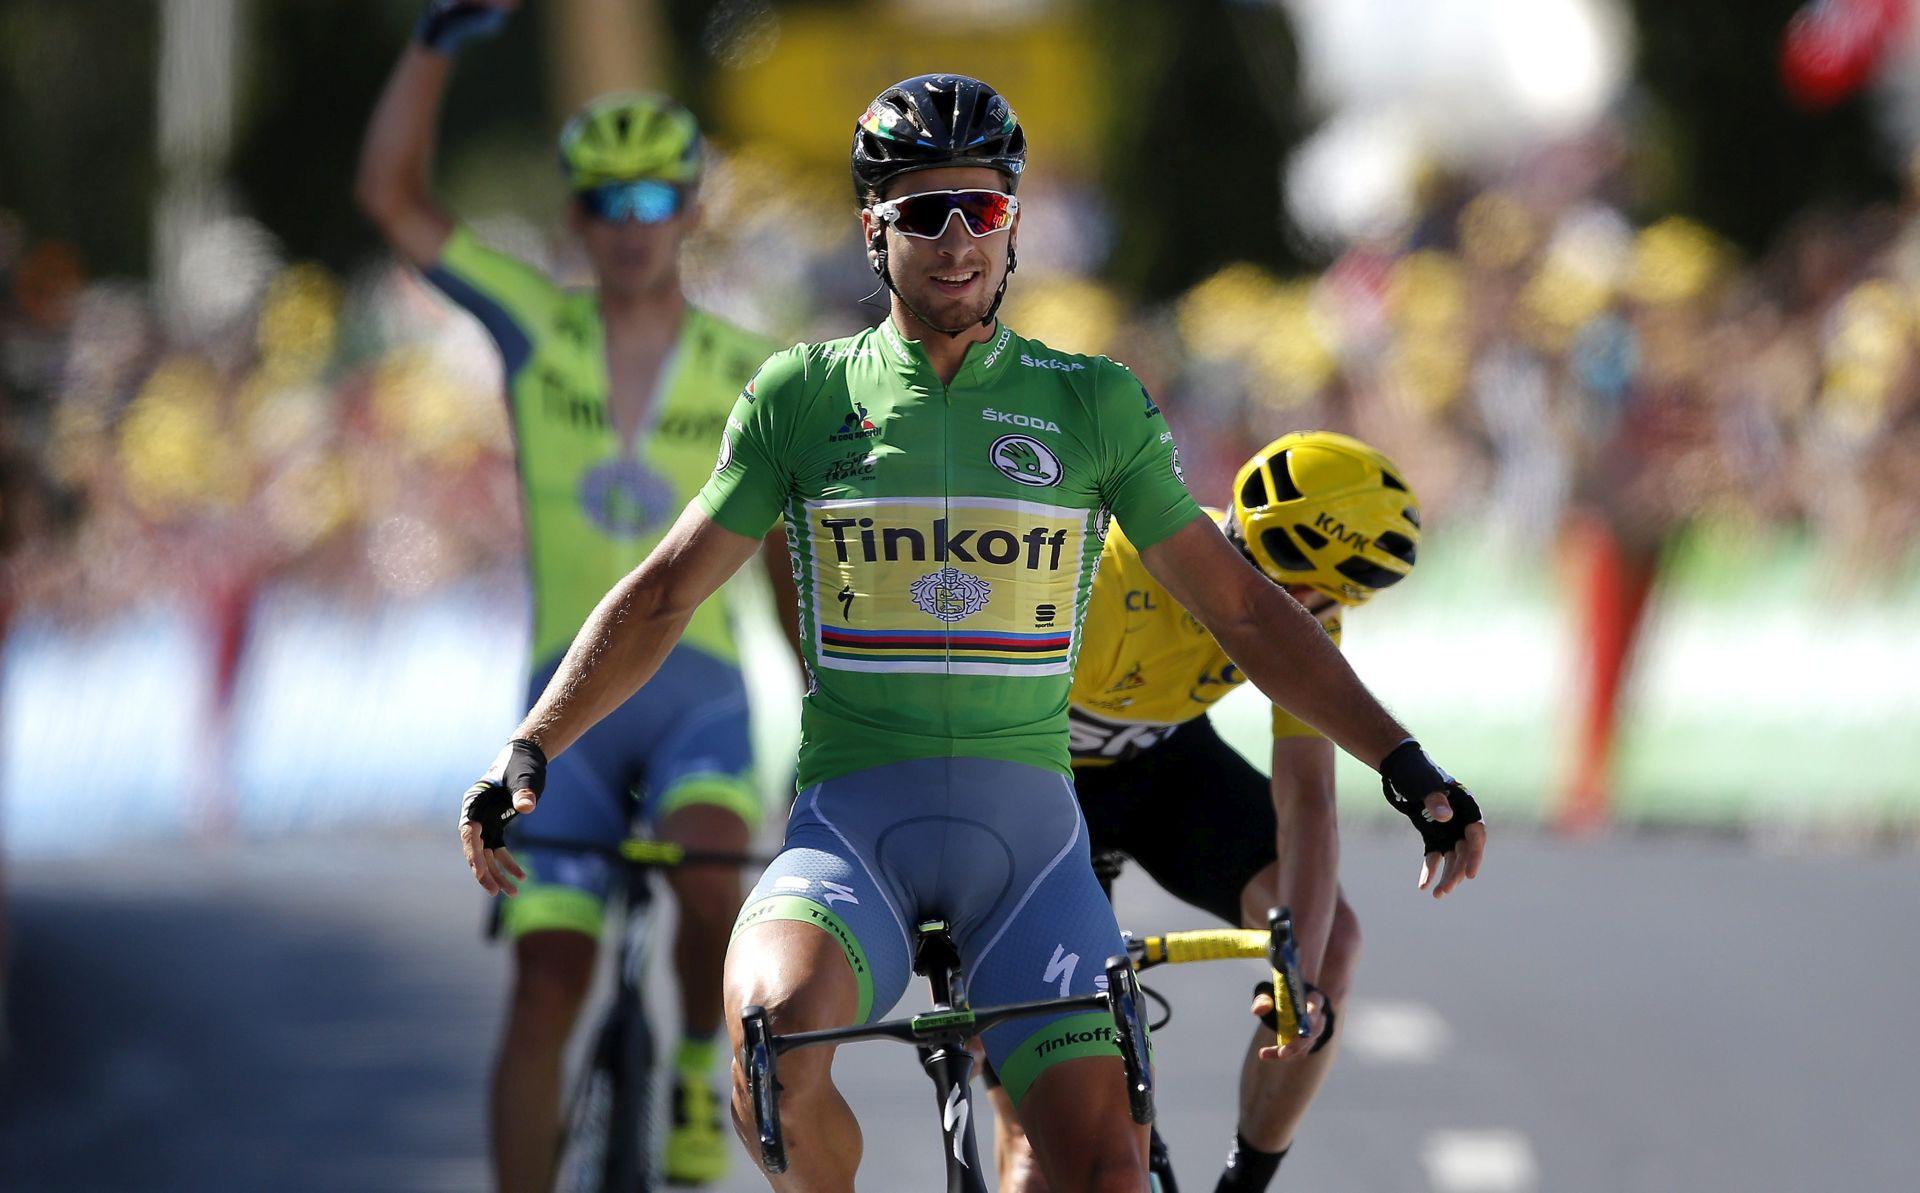 TOUR DE FRANCE: Saganu etapa, Froome i dalje u vodstvu